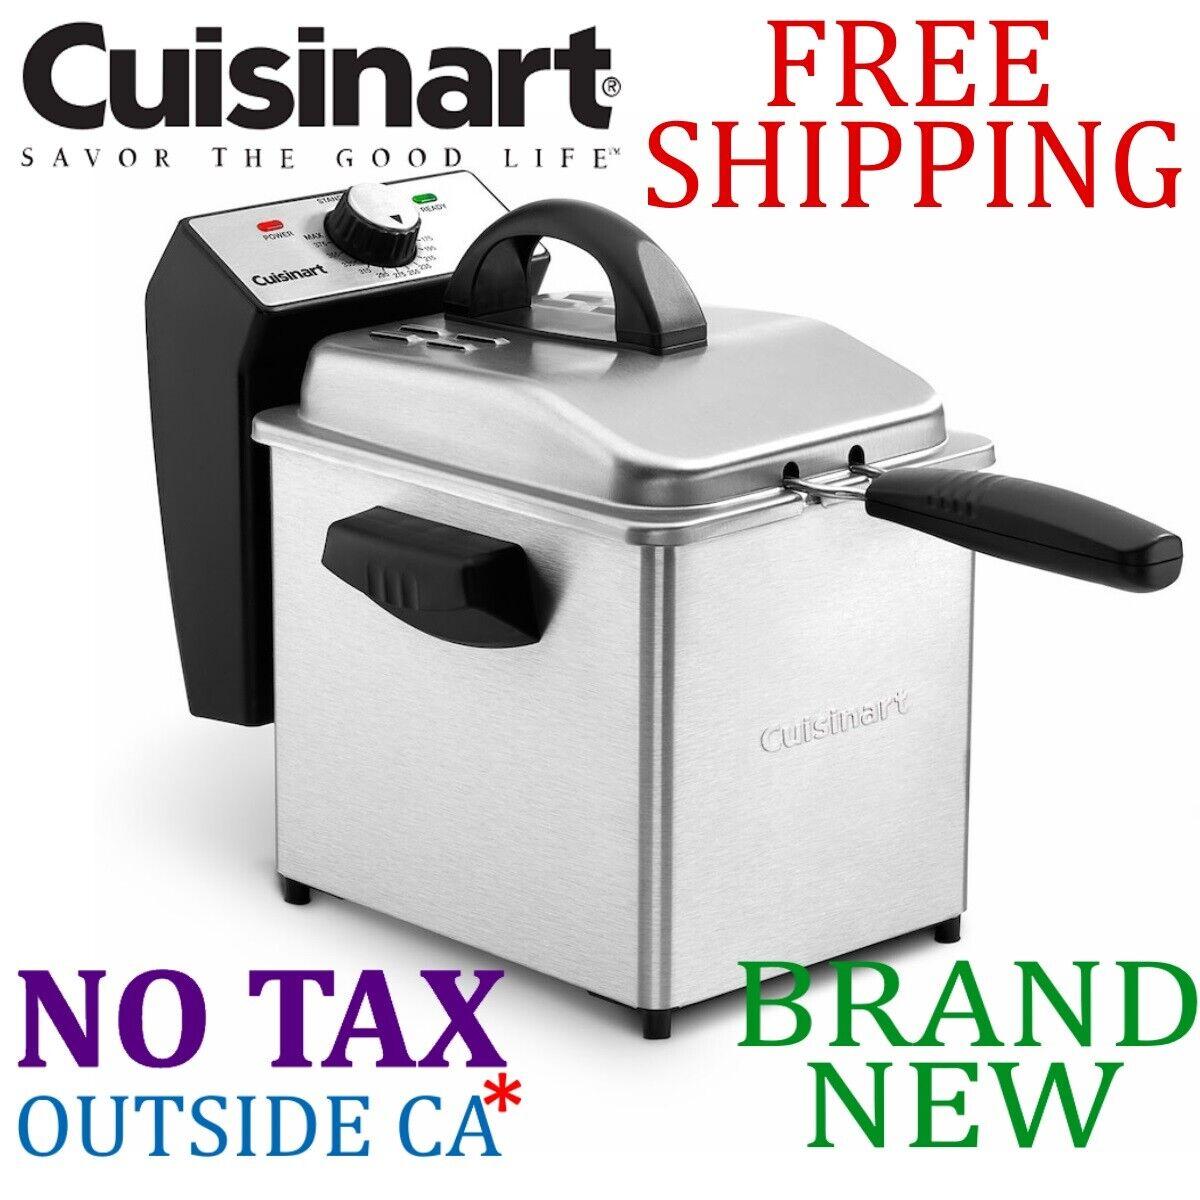 New Cuisinart Compact 2qt Quart DEEP FRYER w Mesh Basket Temp Control 1500W